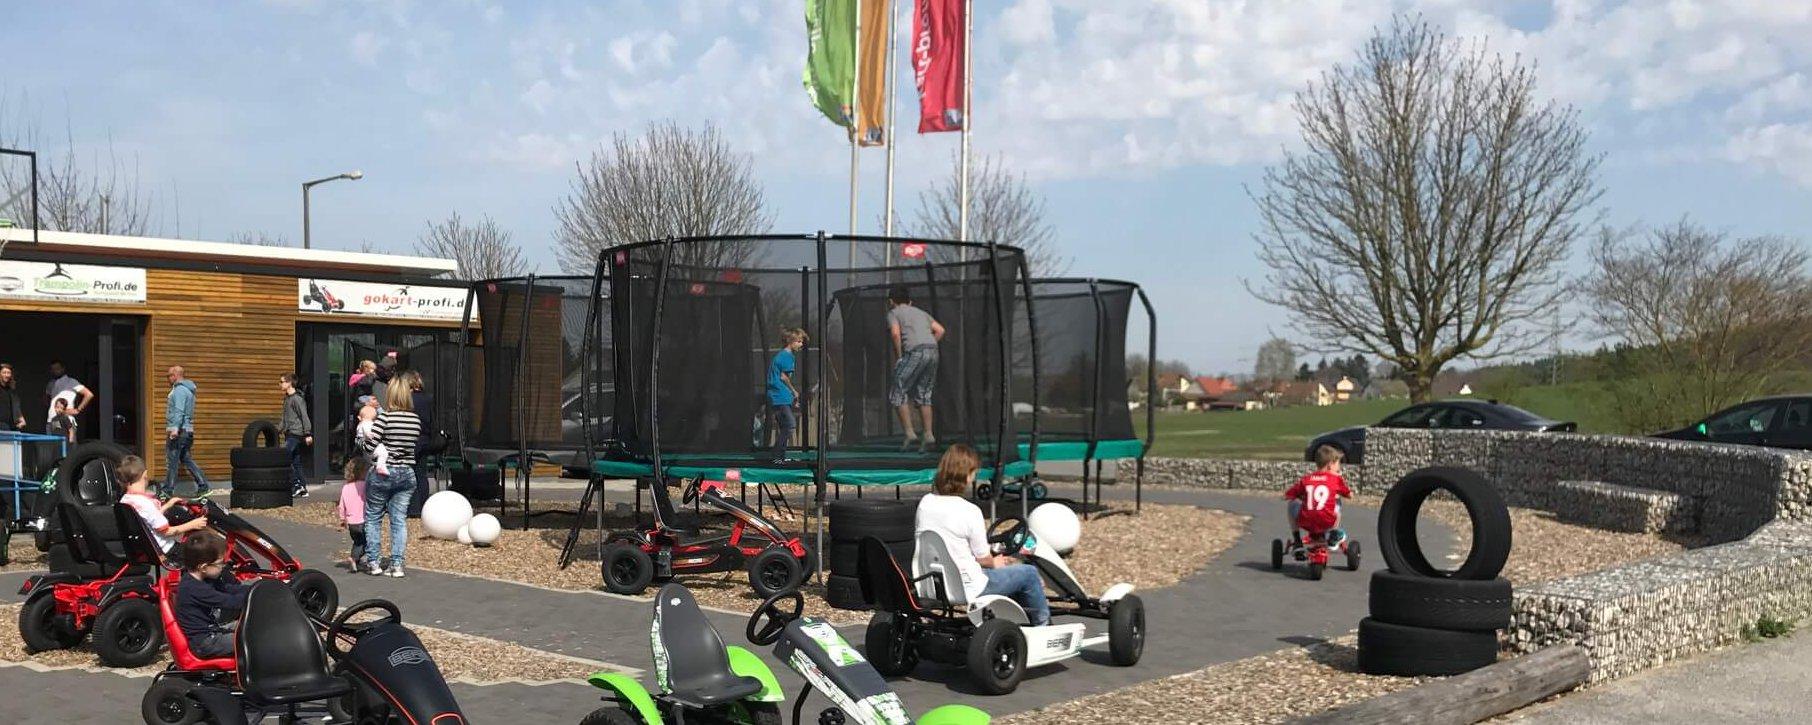 Trampolin Marken Schnäppchen bei trampolin-profi.de 29.04.2017 Lagerverkauf